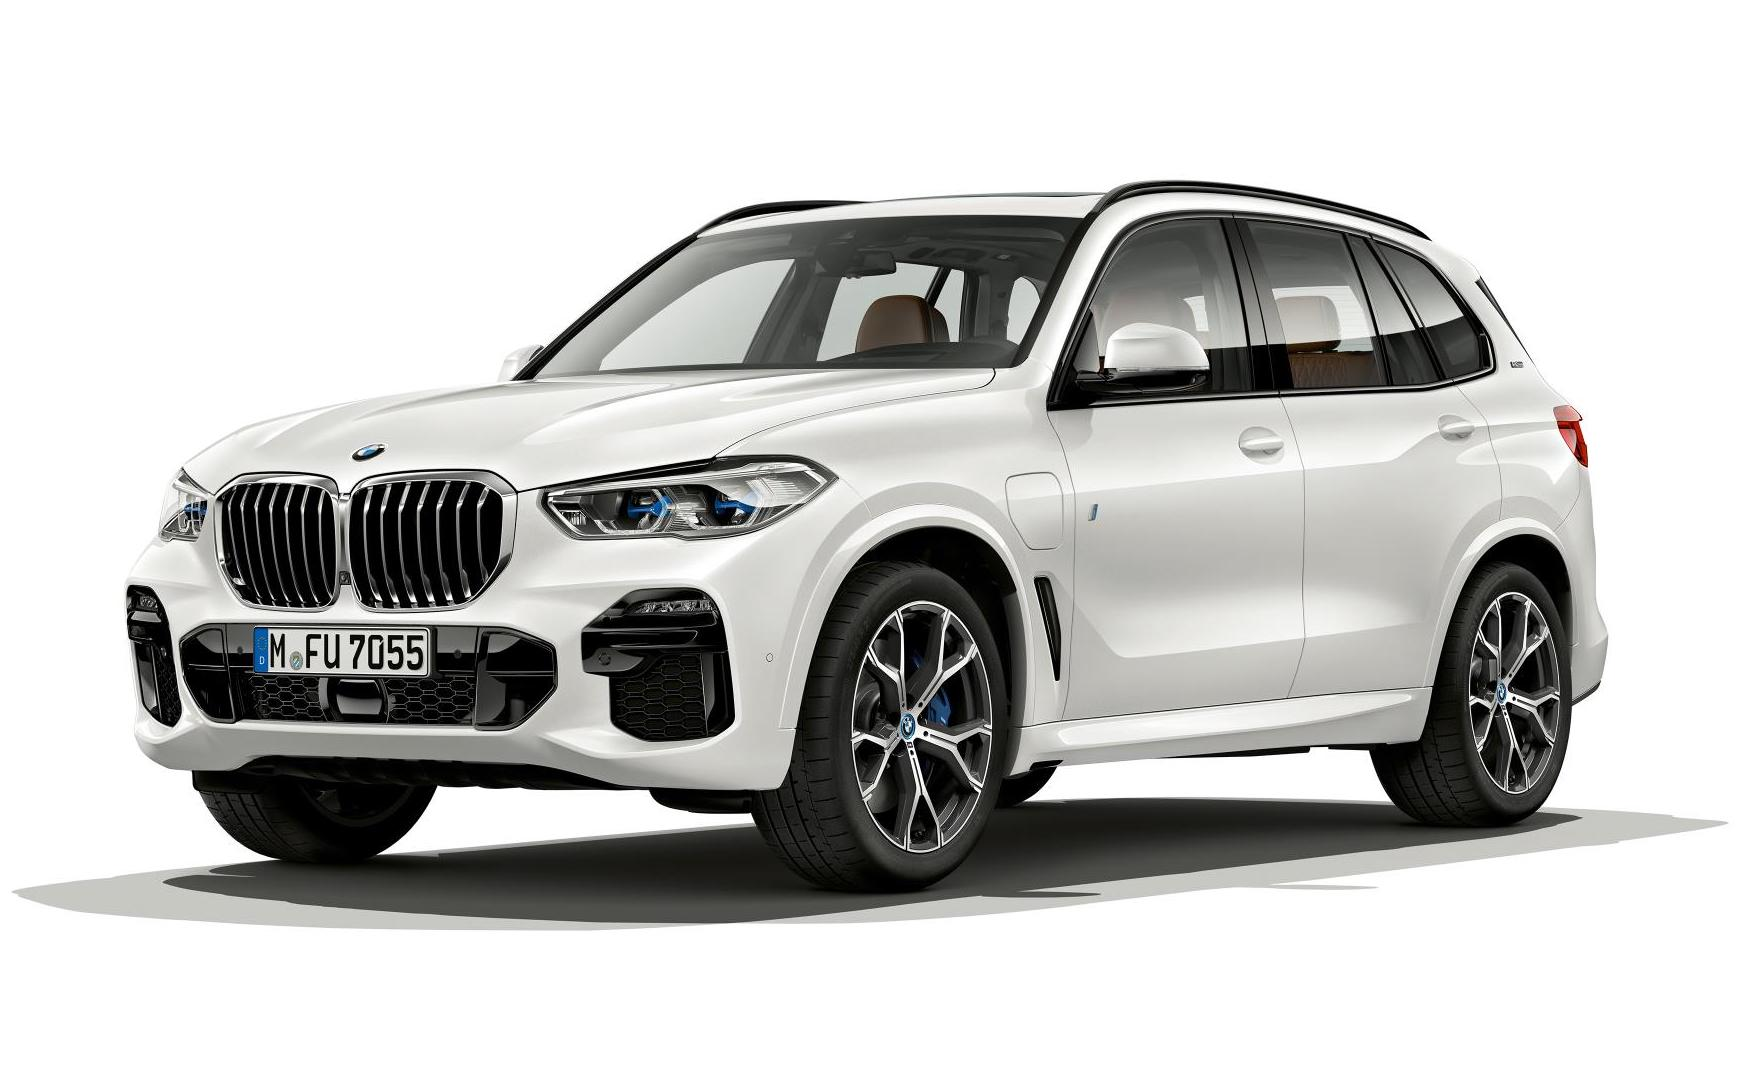 2019 BMW X5 xDrive45e brings back powerful inline-6 hybrid ...